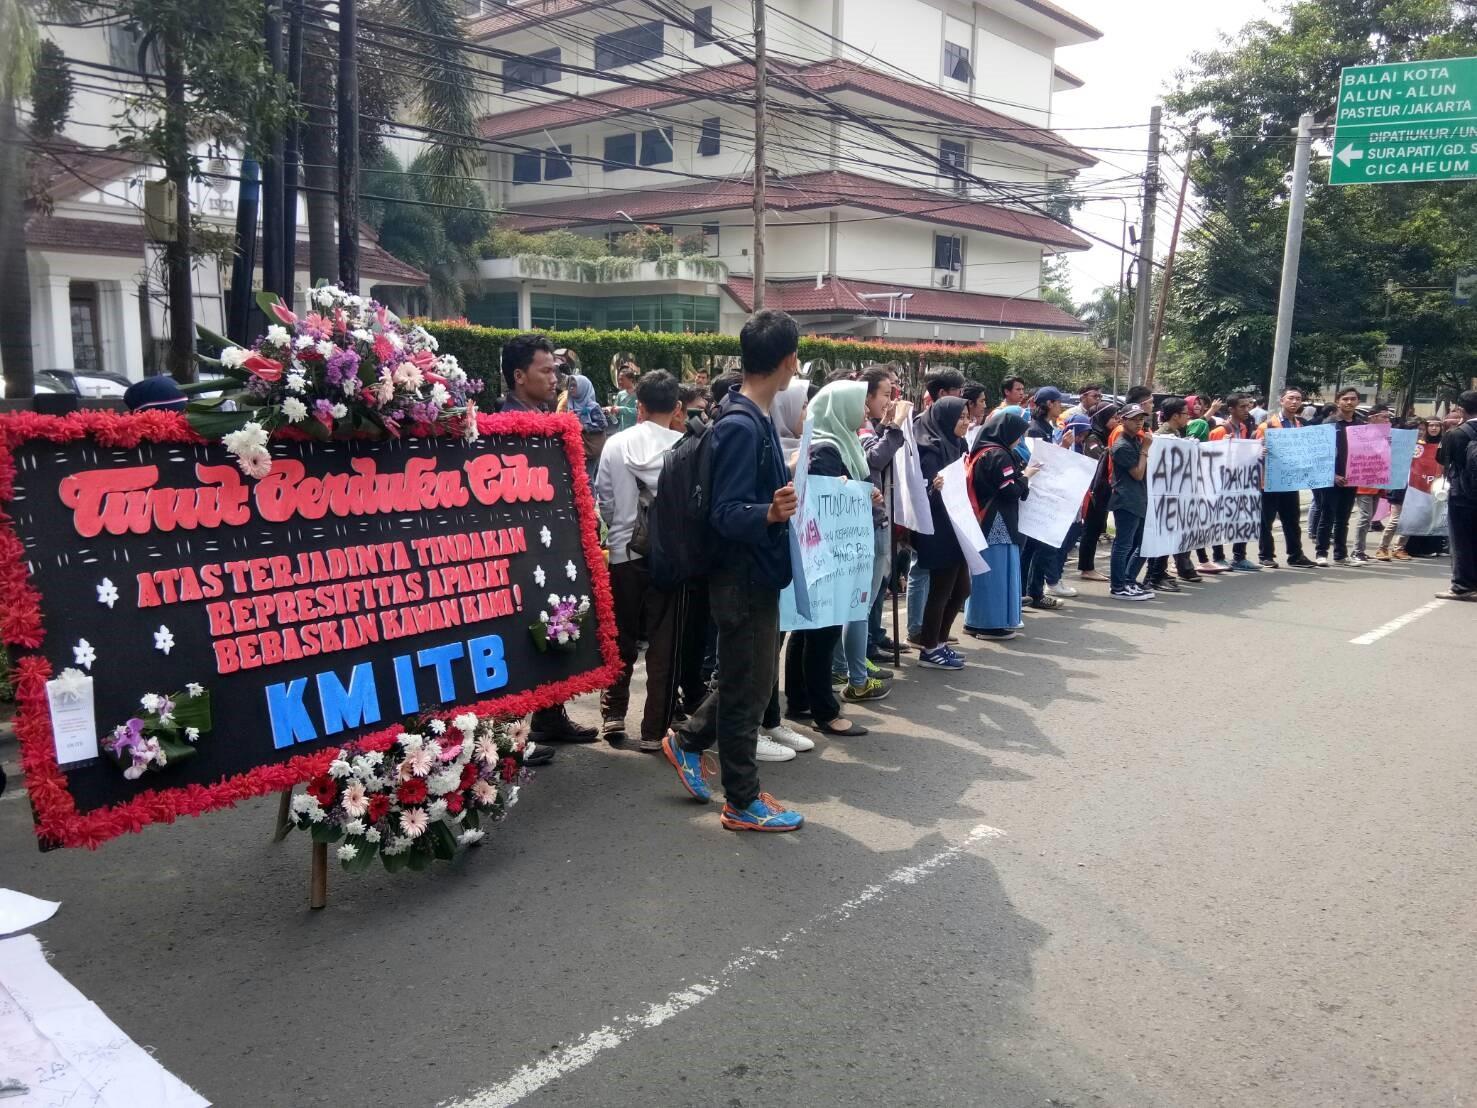 Reprefisitas Aparat CFD Bandung